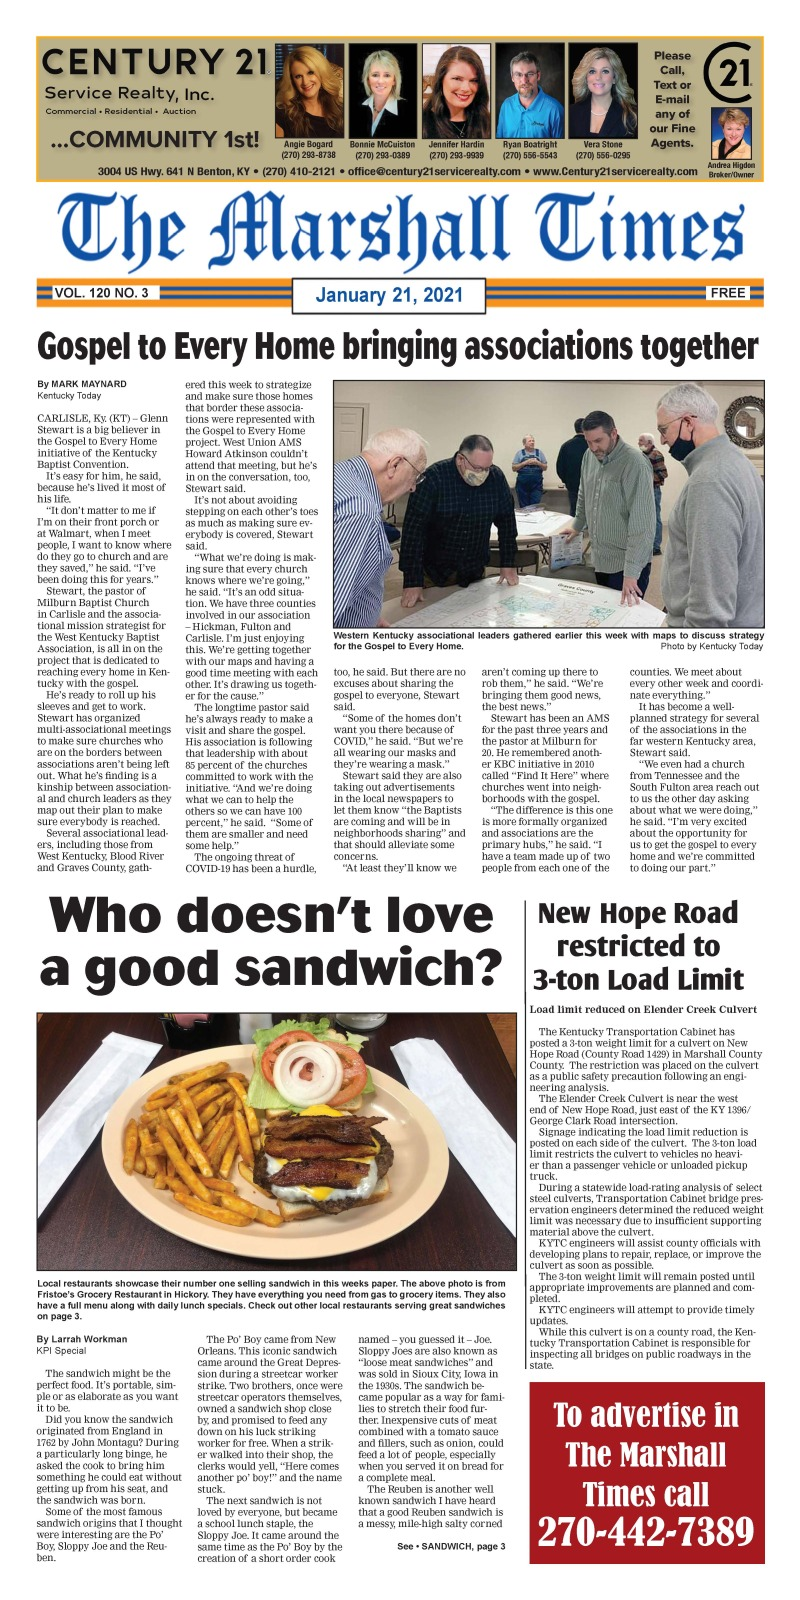 The Marshall Times 1-21-21